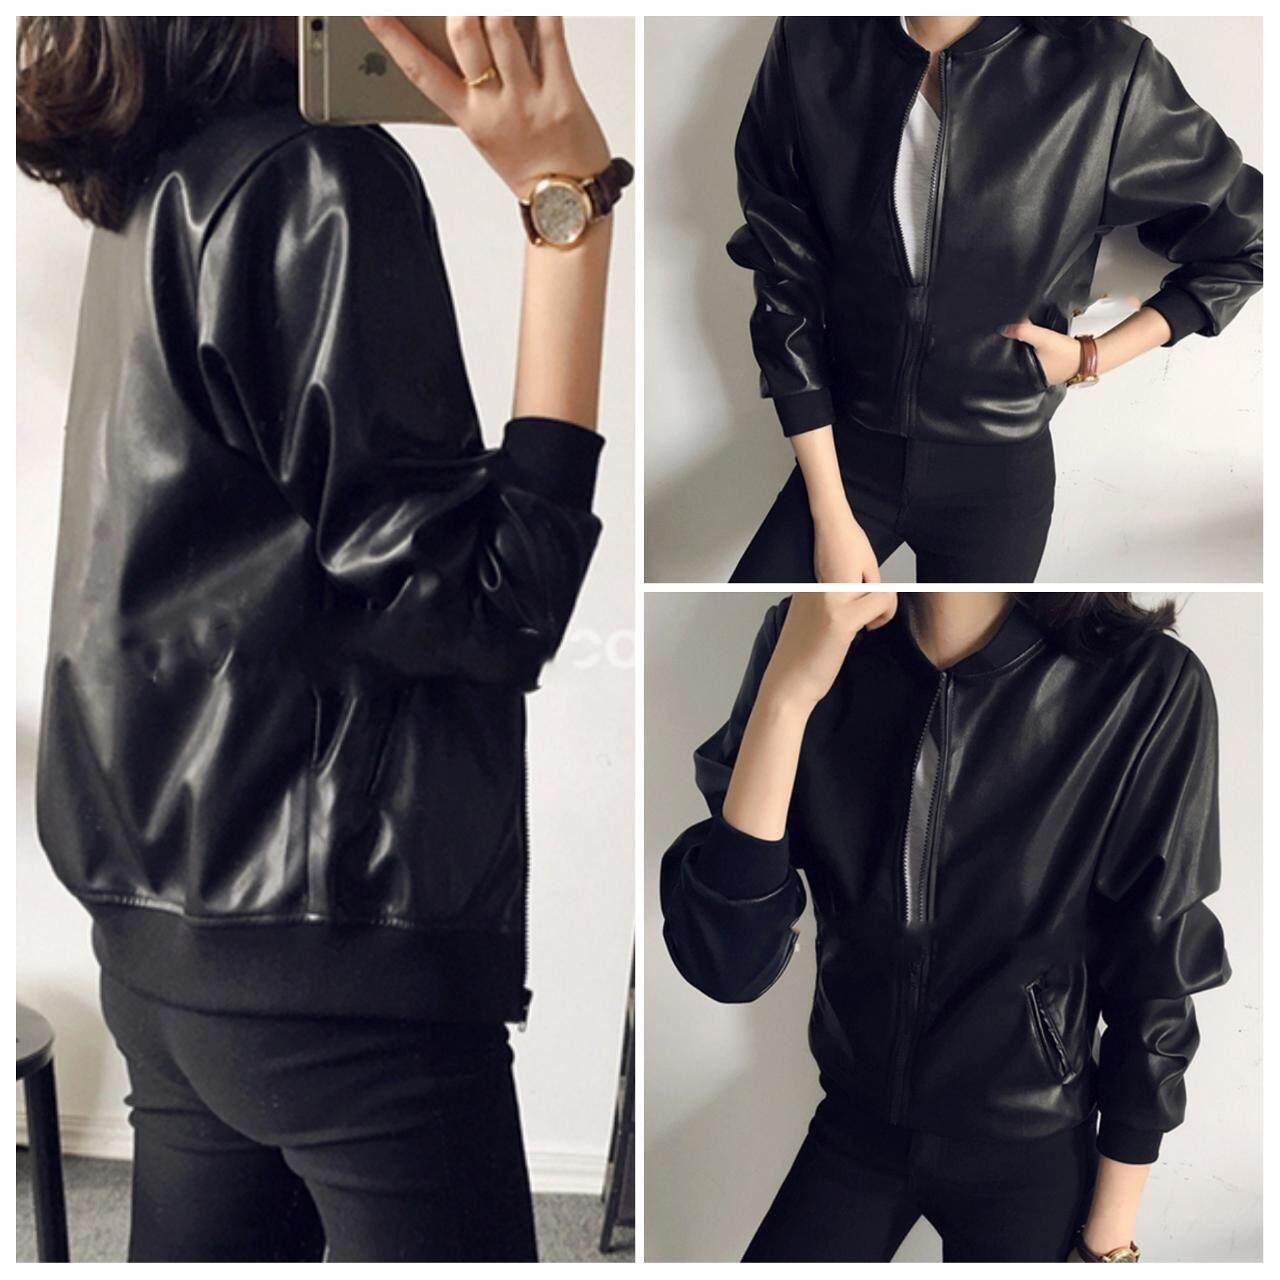 536c56b7f Msia Desiree3 Women Premium PU Leather Black Jacket